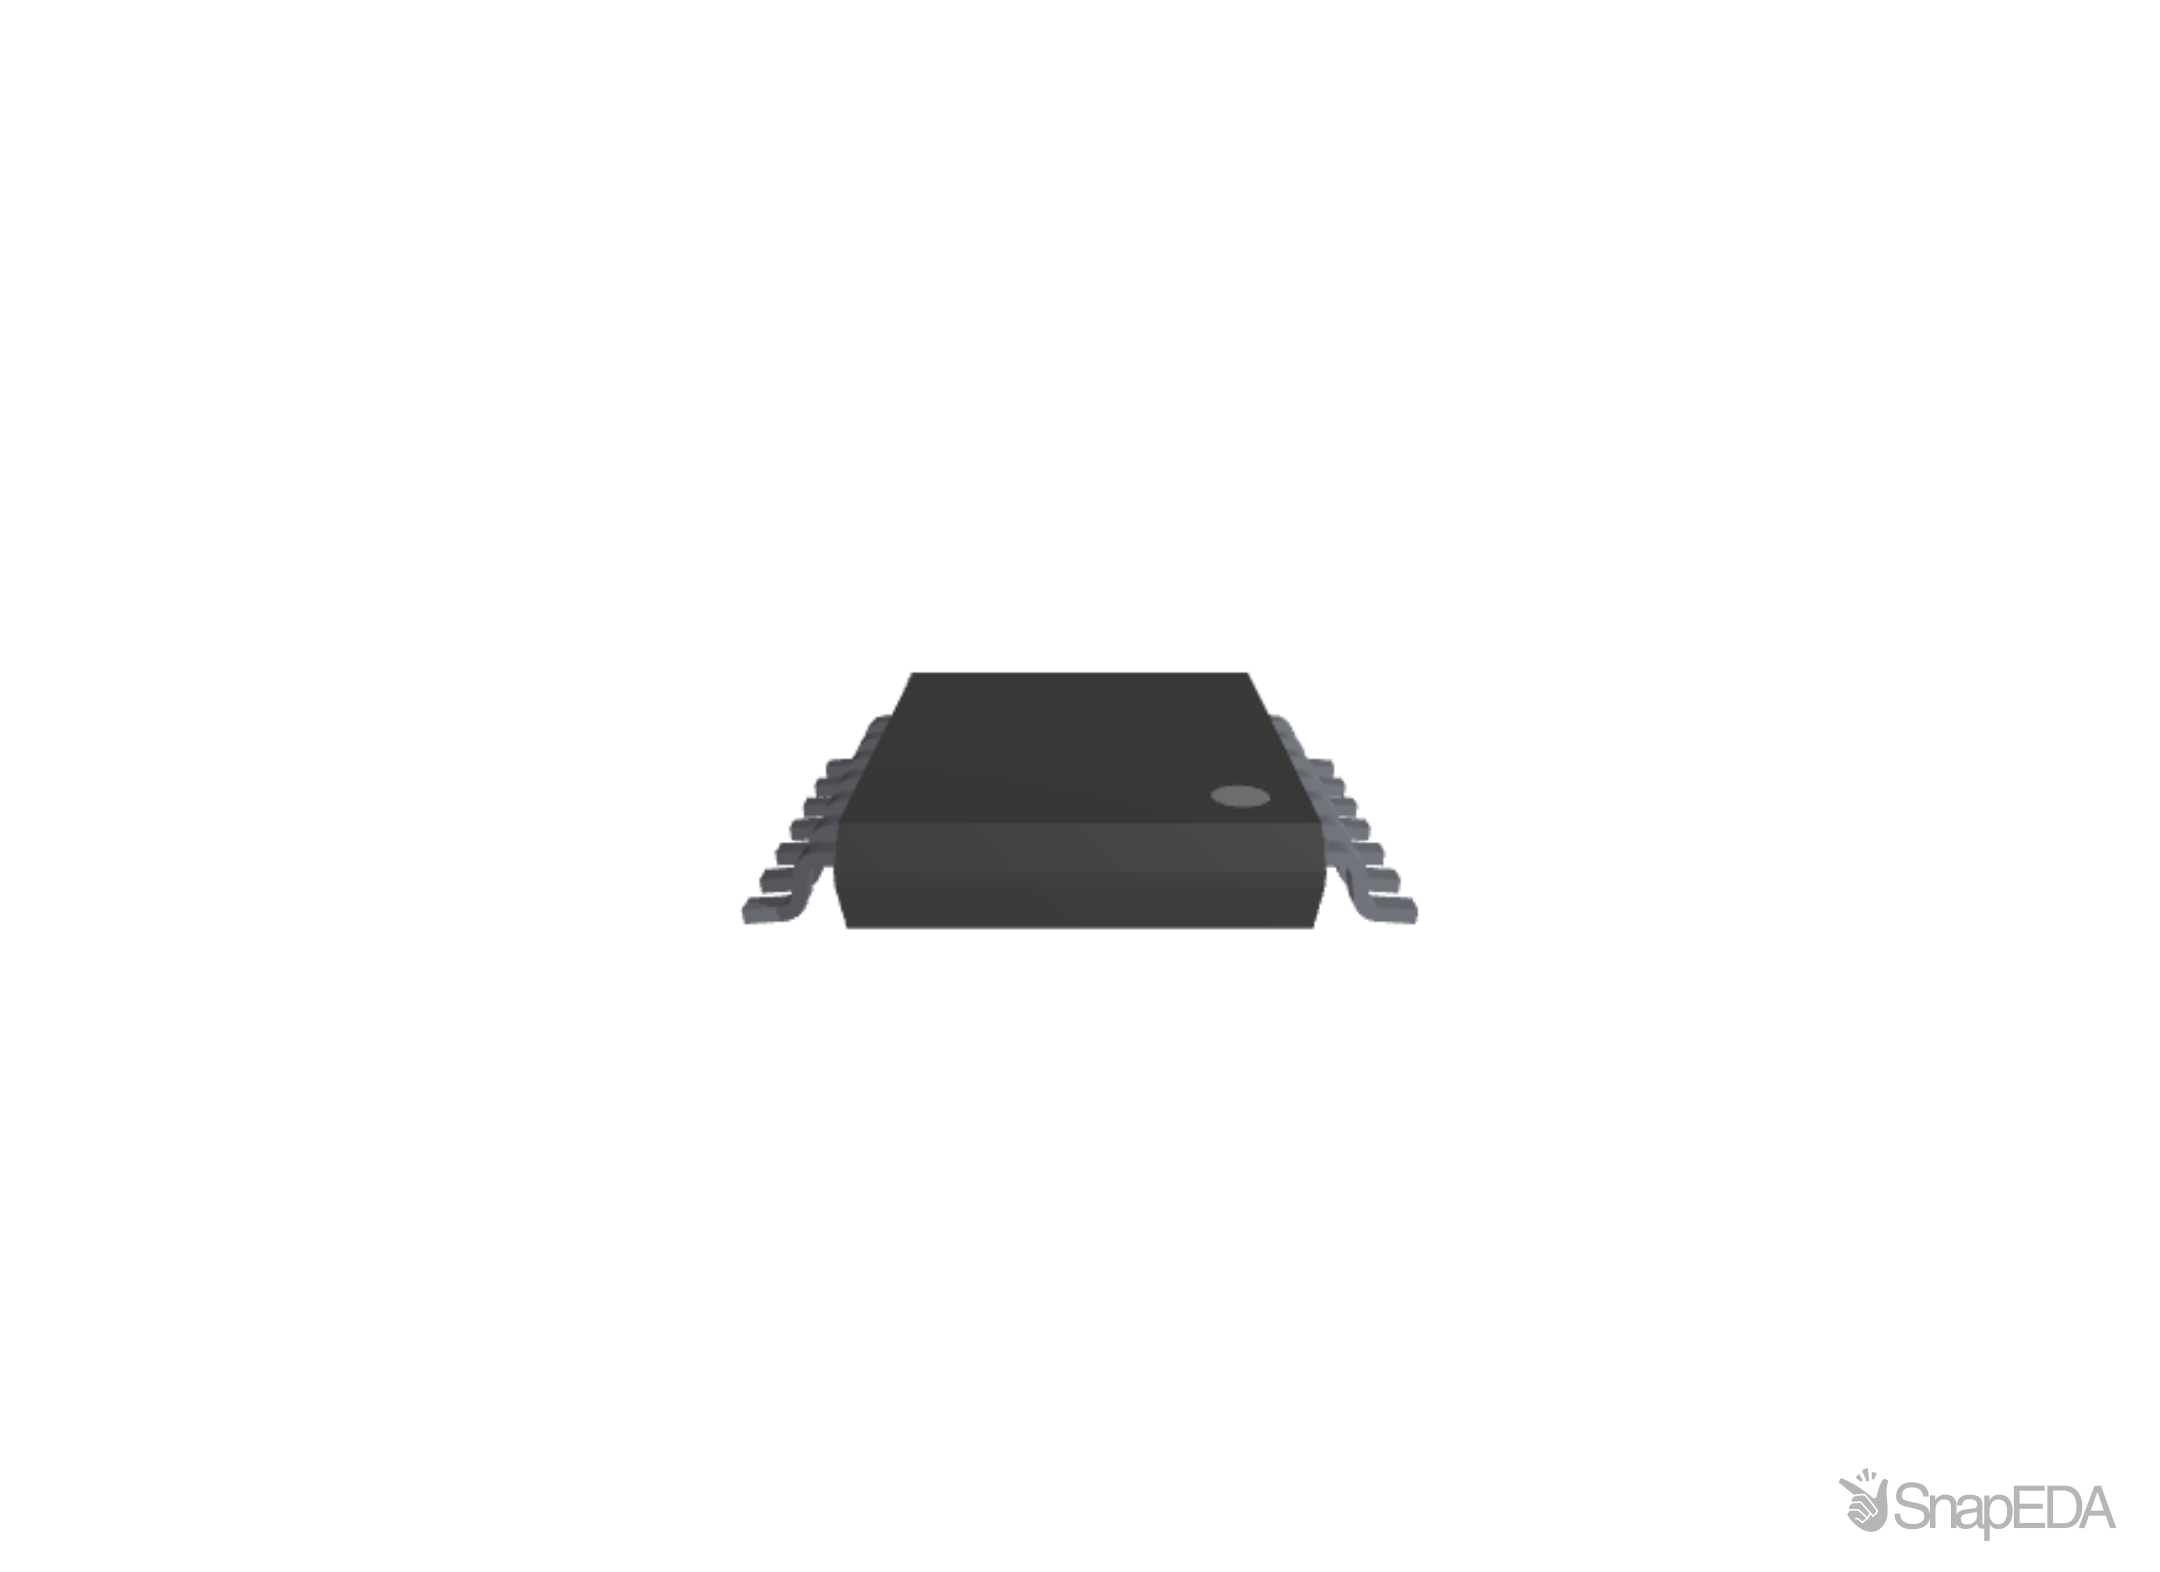 TPS23753APWR 3D Model